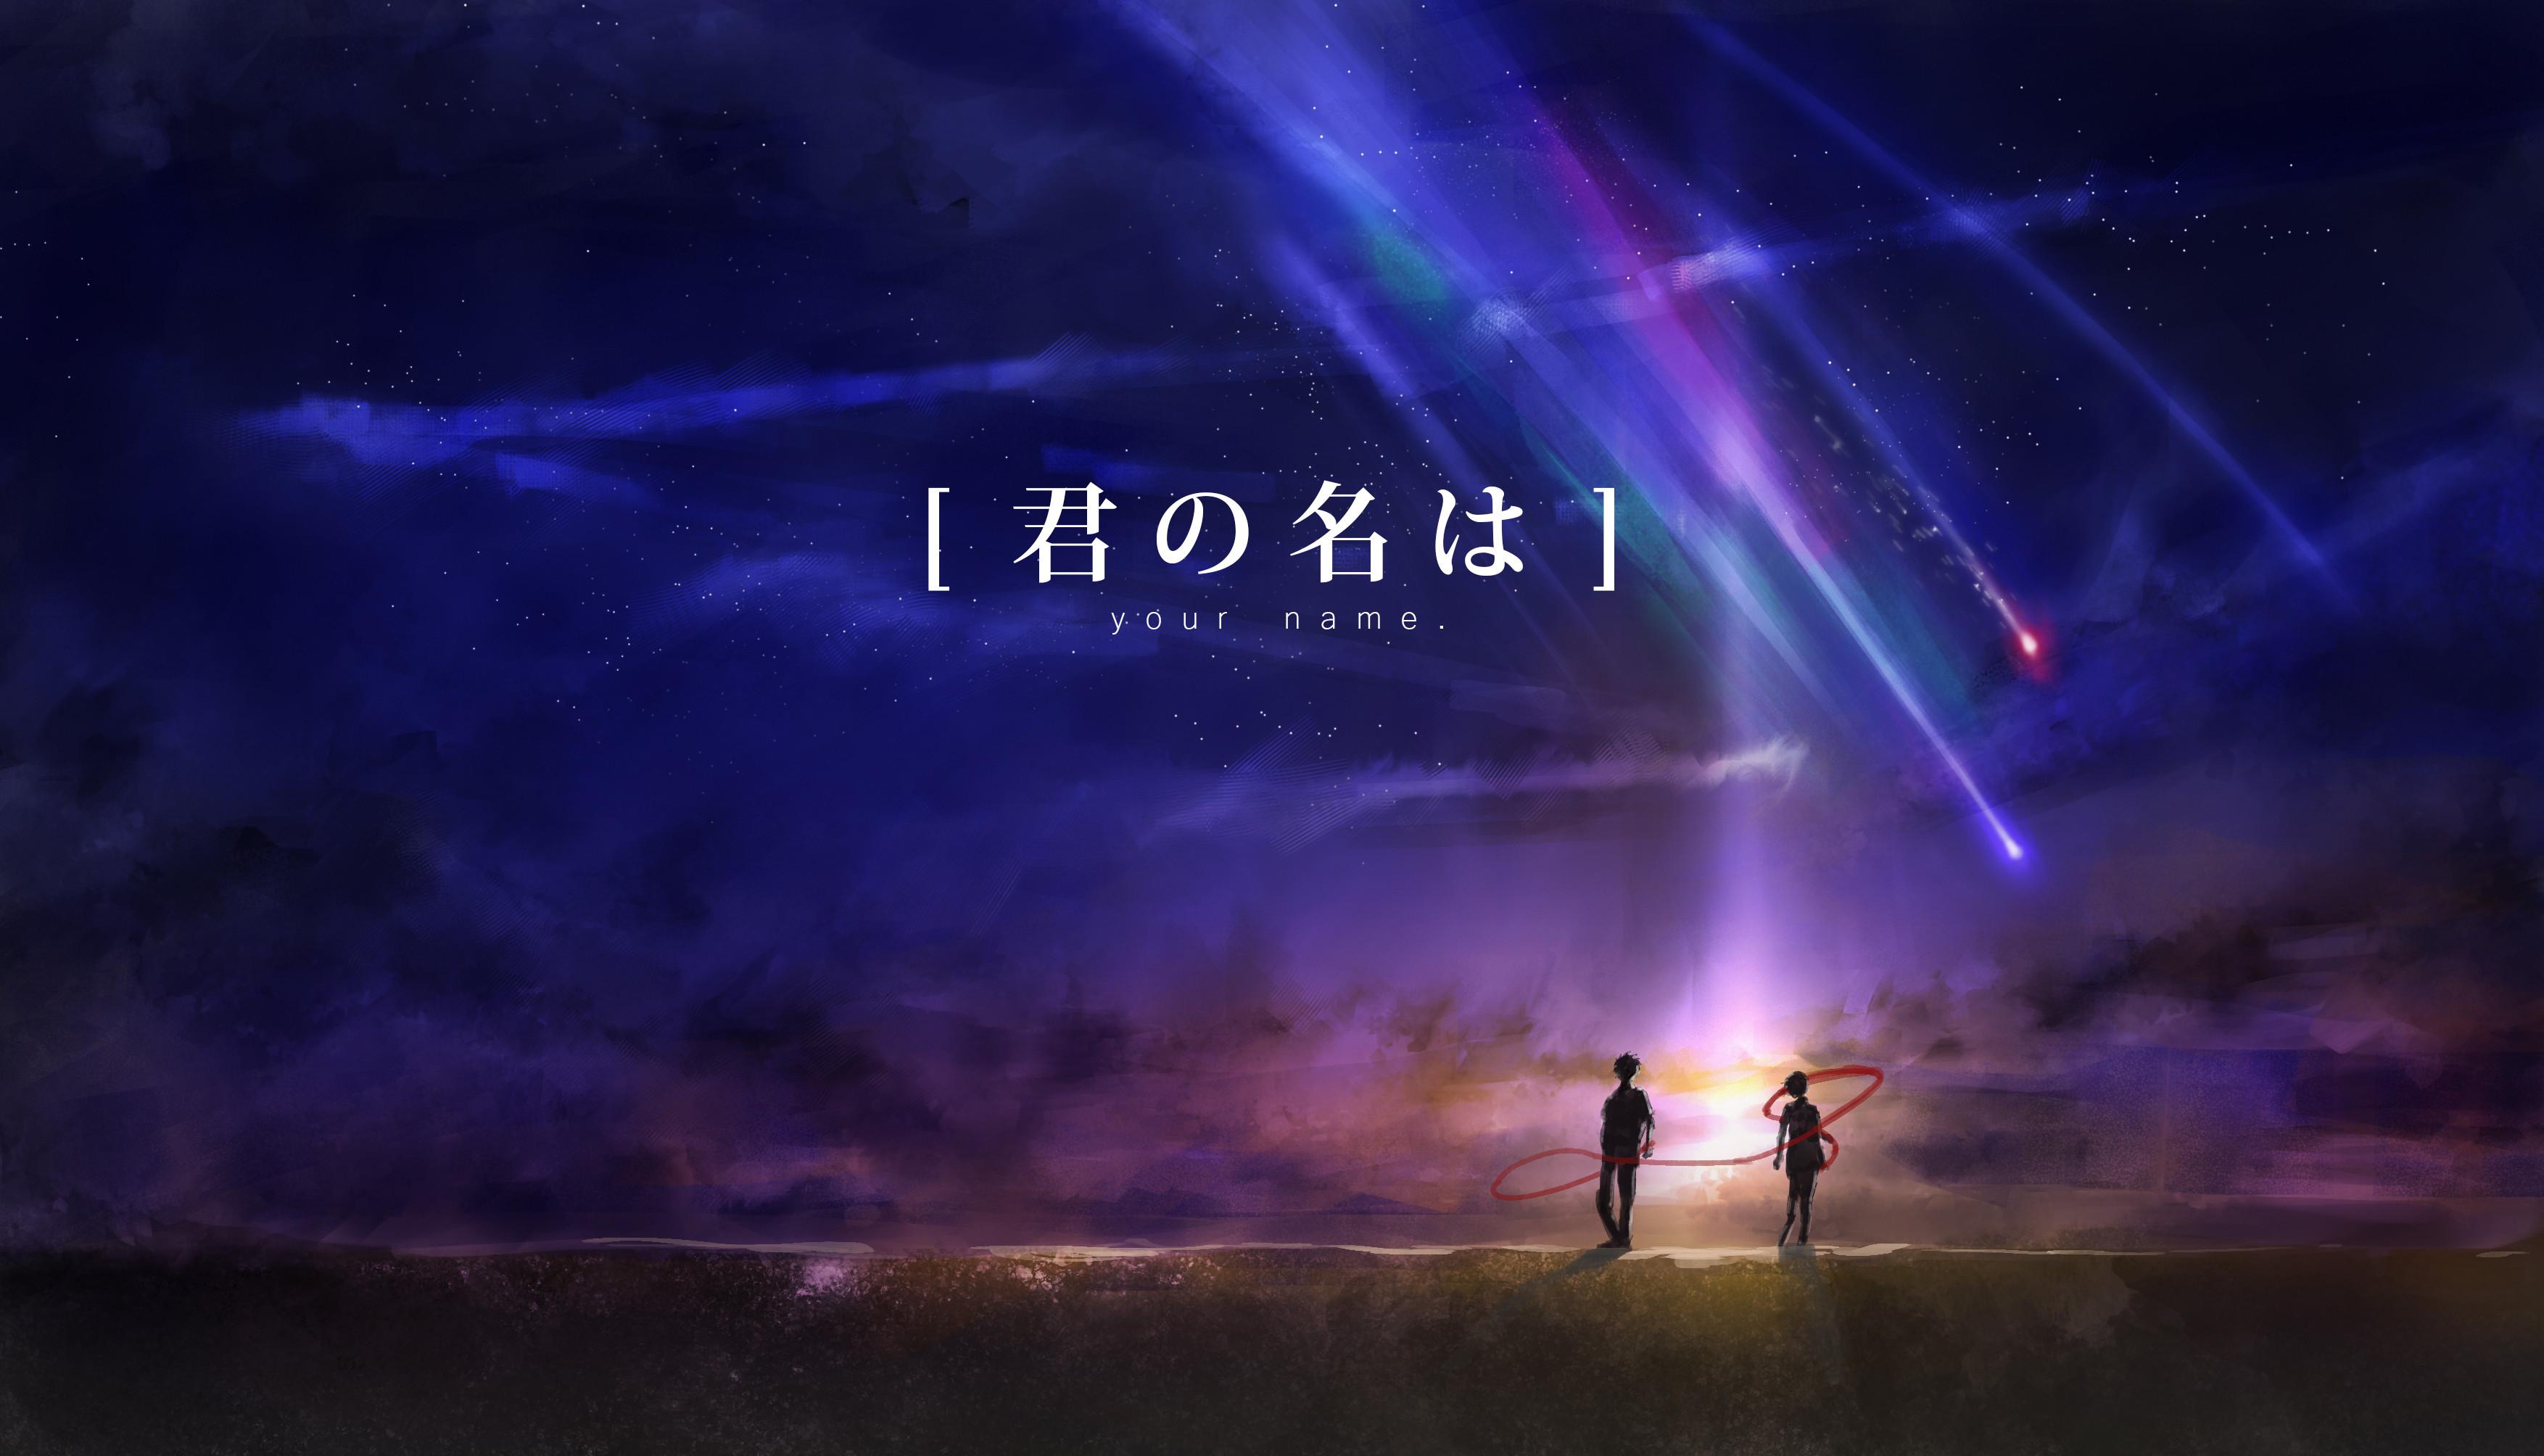 Kimi No Na Wa 1080p Wallpaper Posted By Christopher Johnson